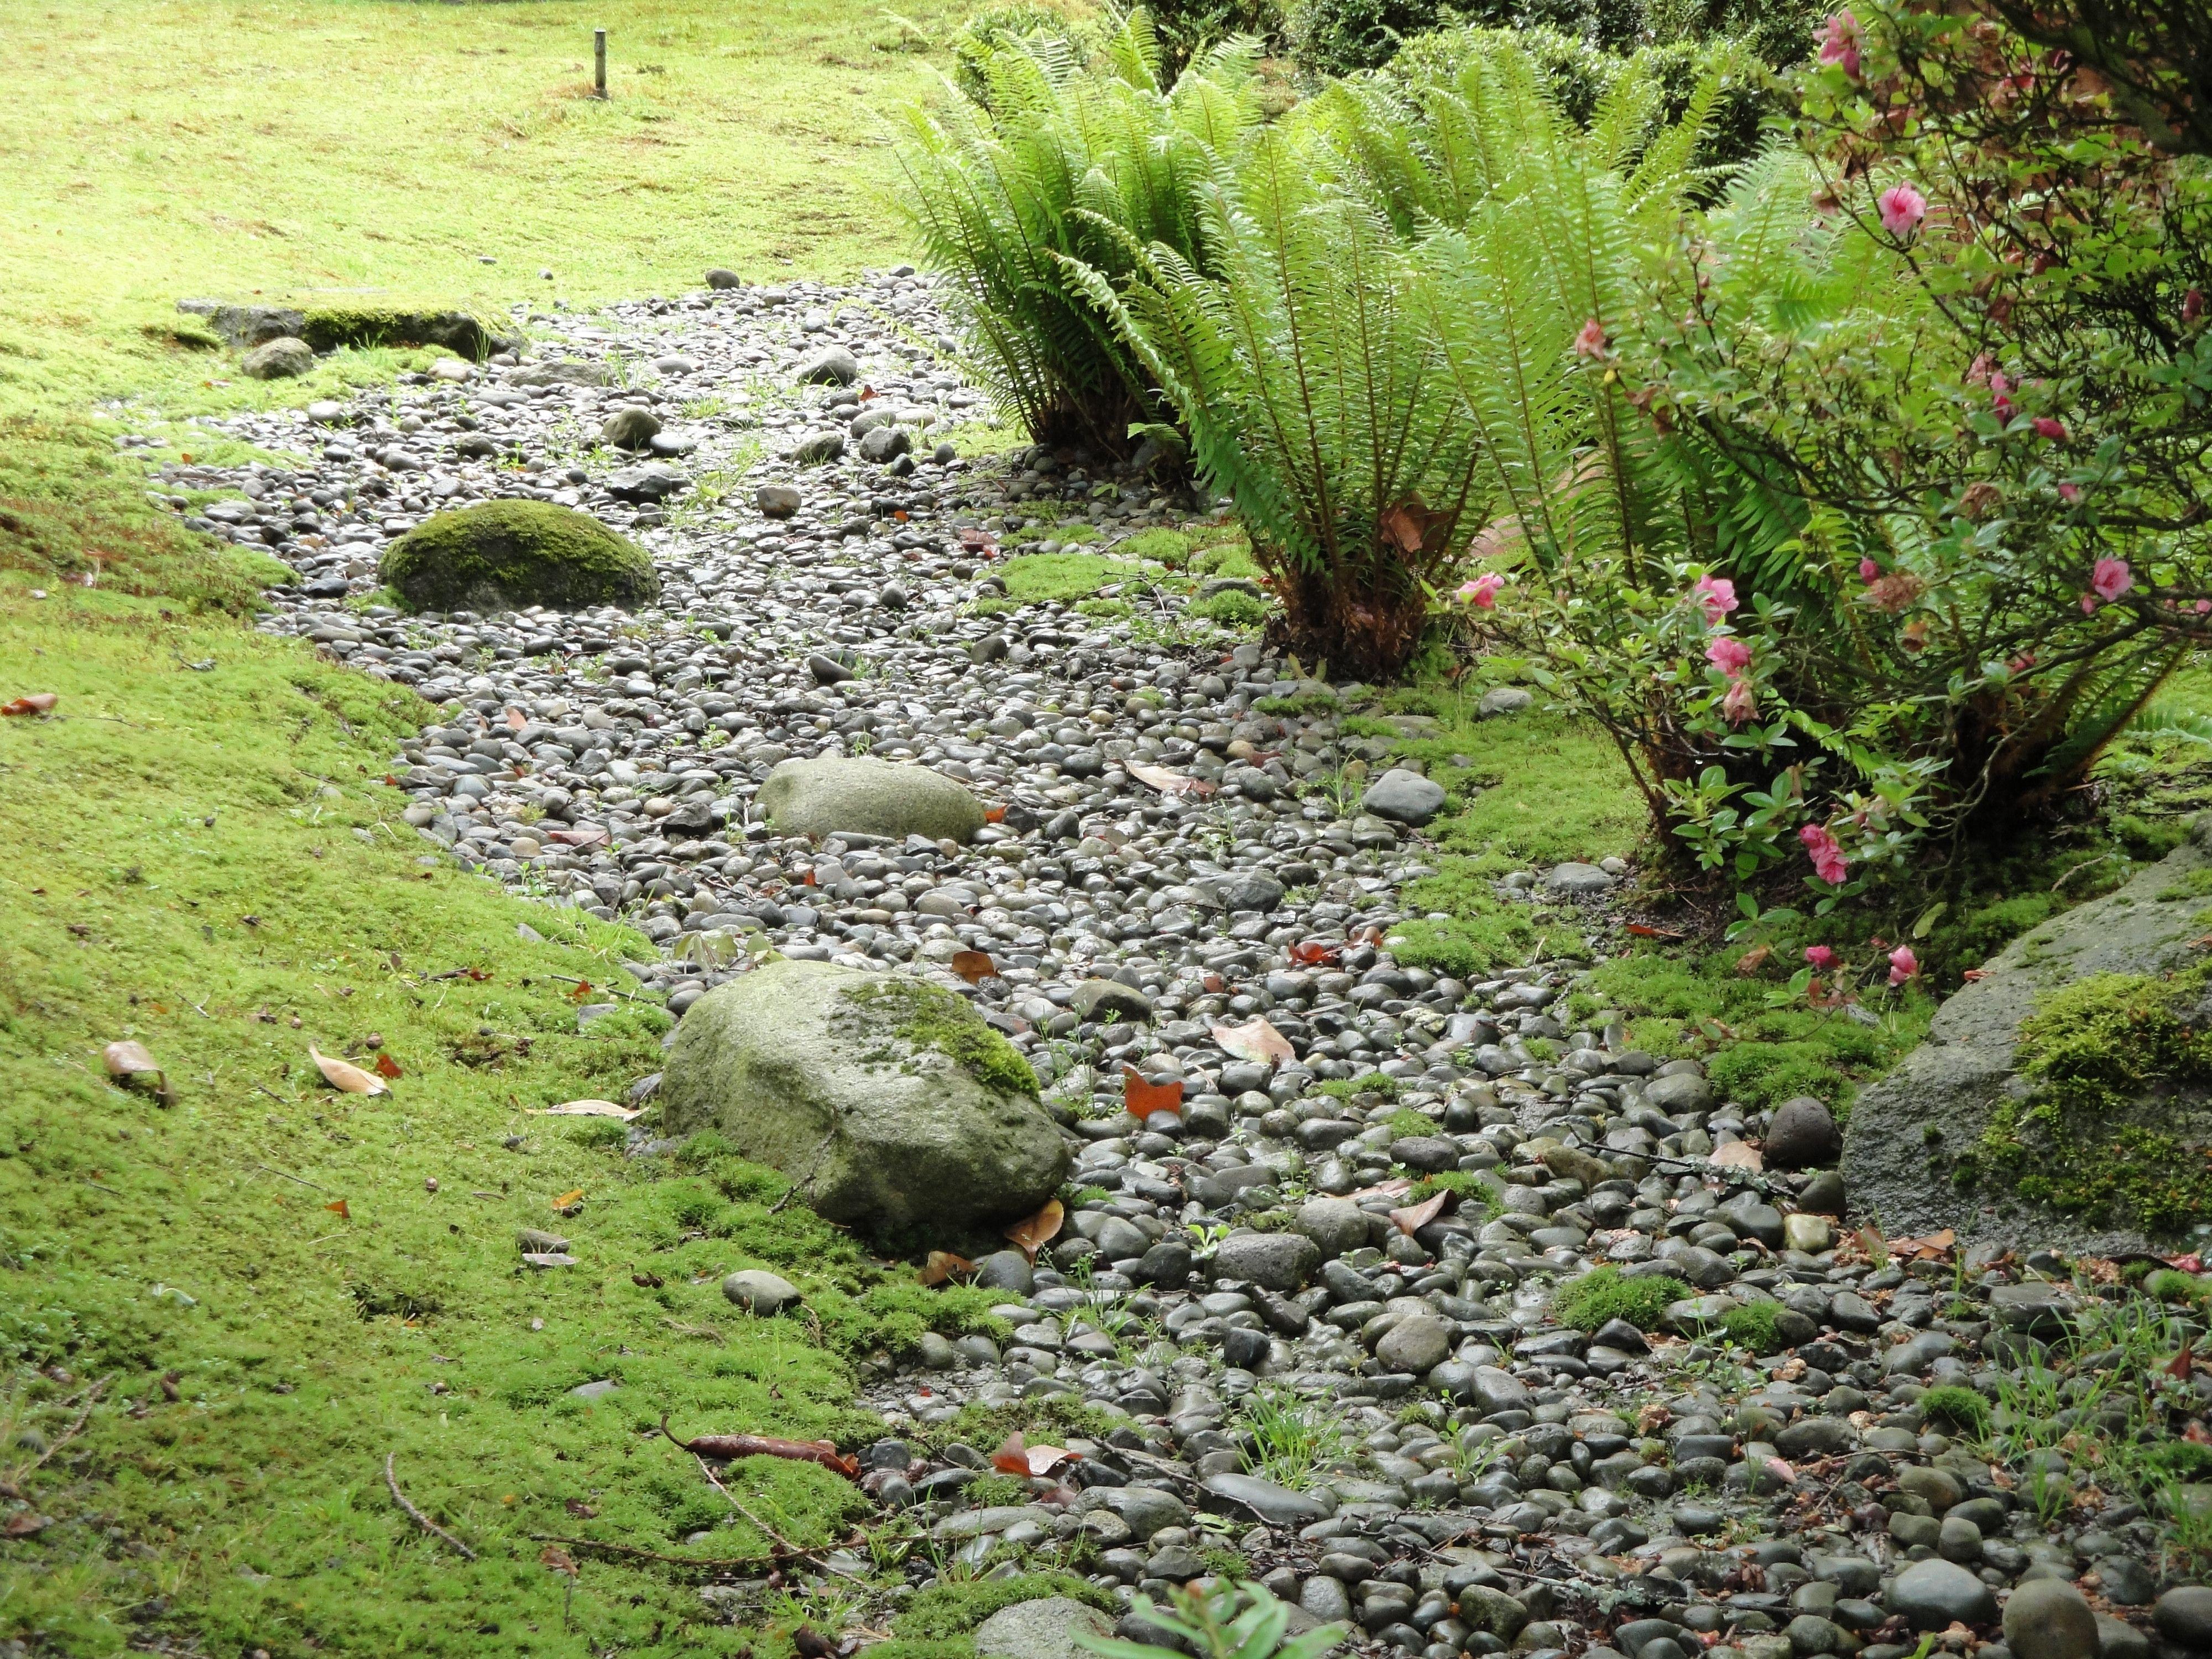 garden design dry river bed design inspiration 210010 decorating ideas - Garden Design Dry River Bed